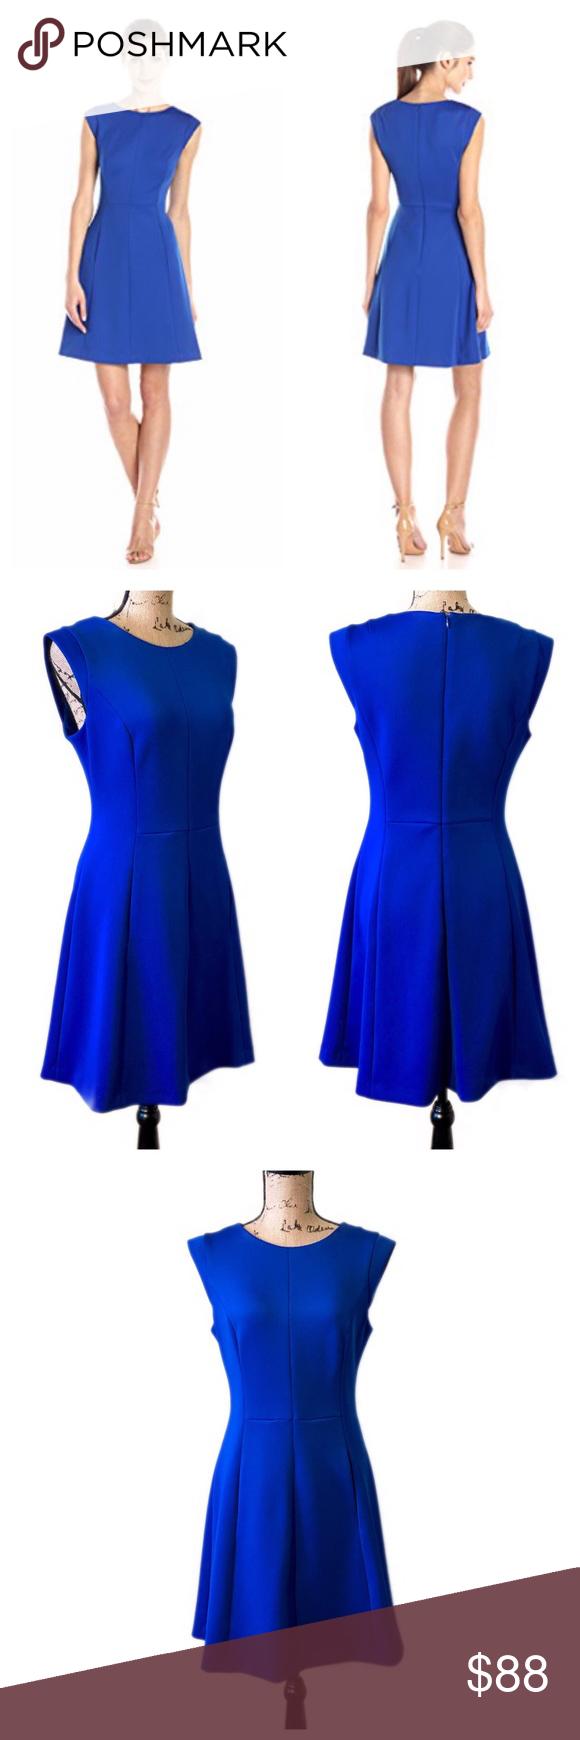 Vince Camuto Cobalt Royal Blue Fit Flare Dress Dresses Fit Flare Dress Clothes Design [ 1740 x 580 Pixel ]